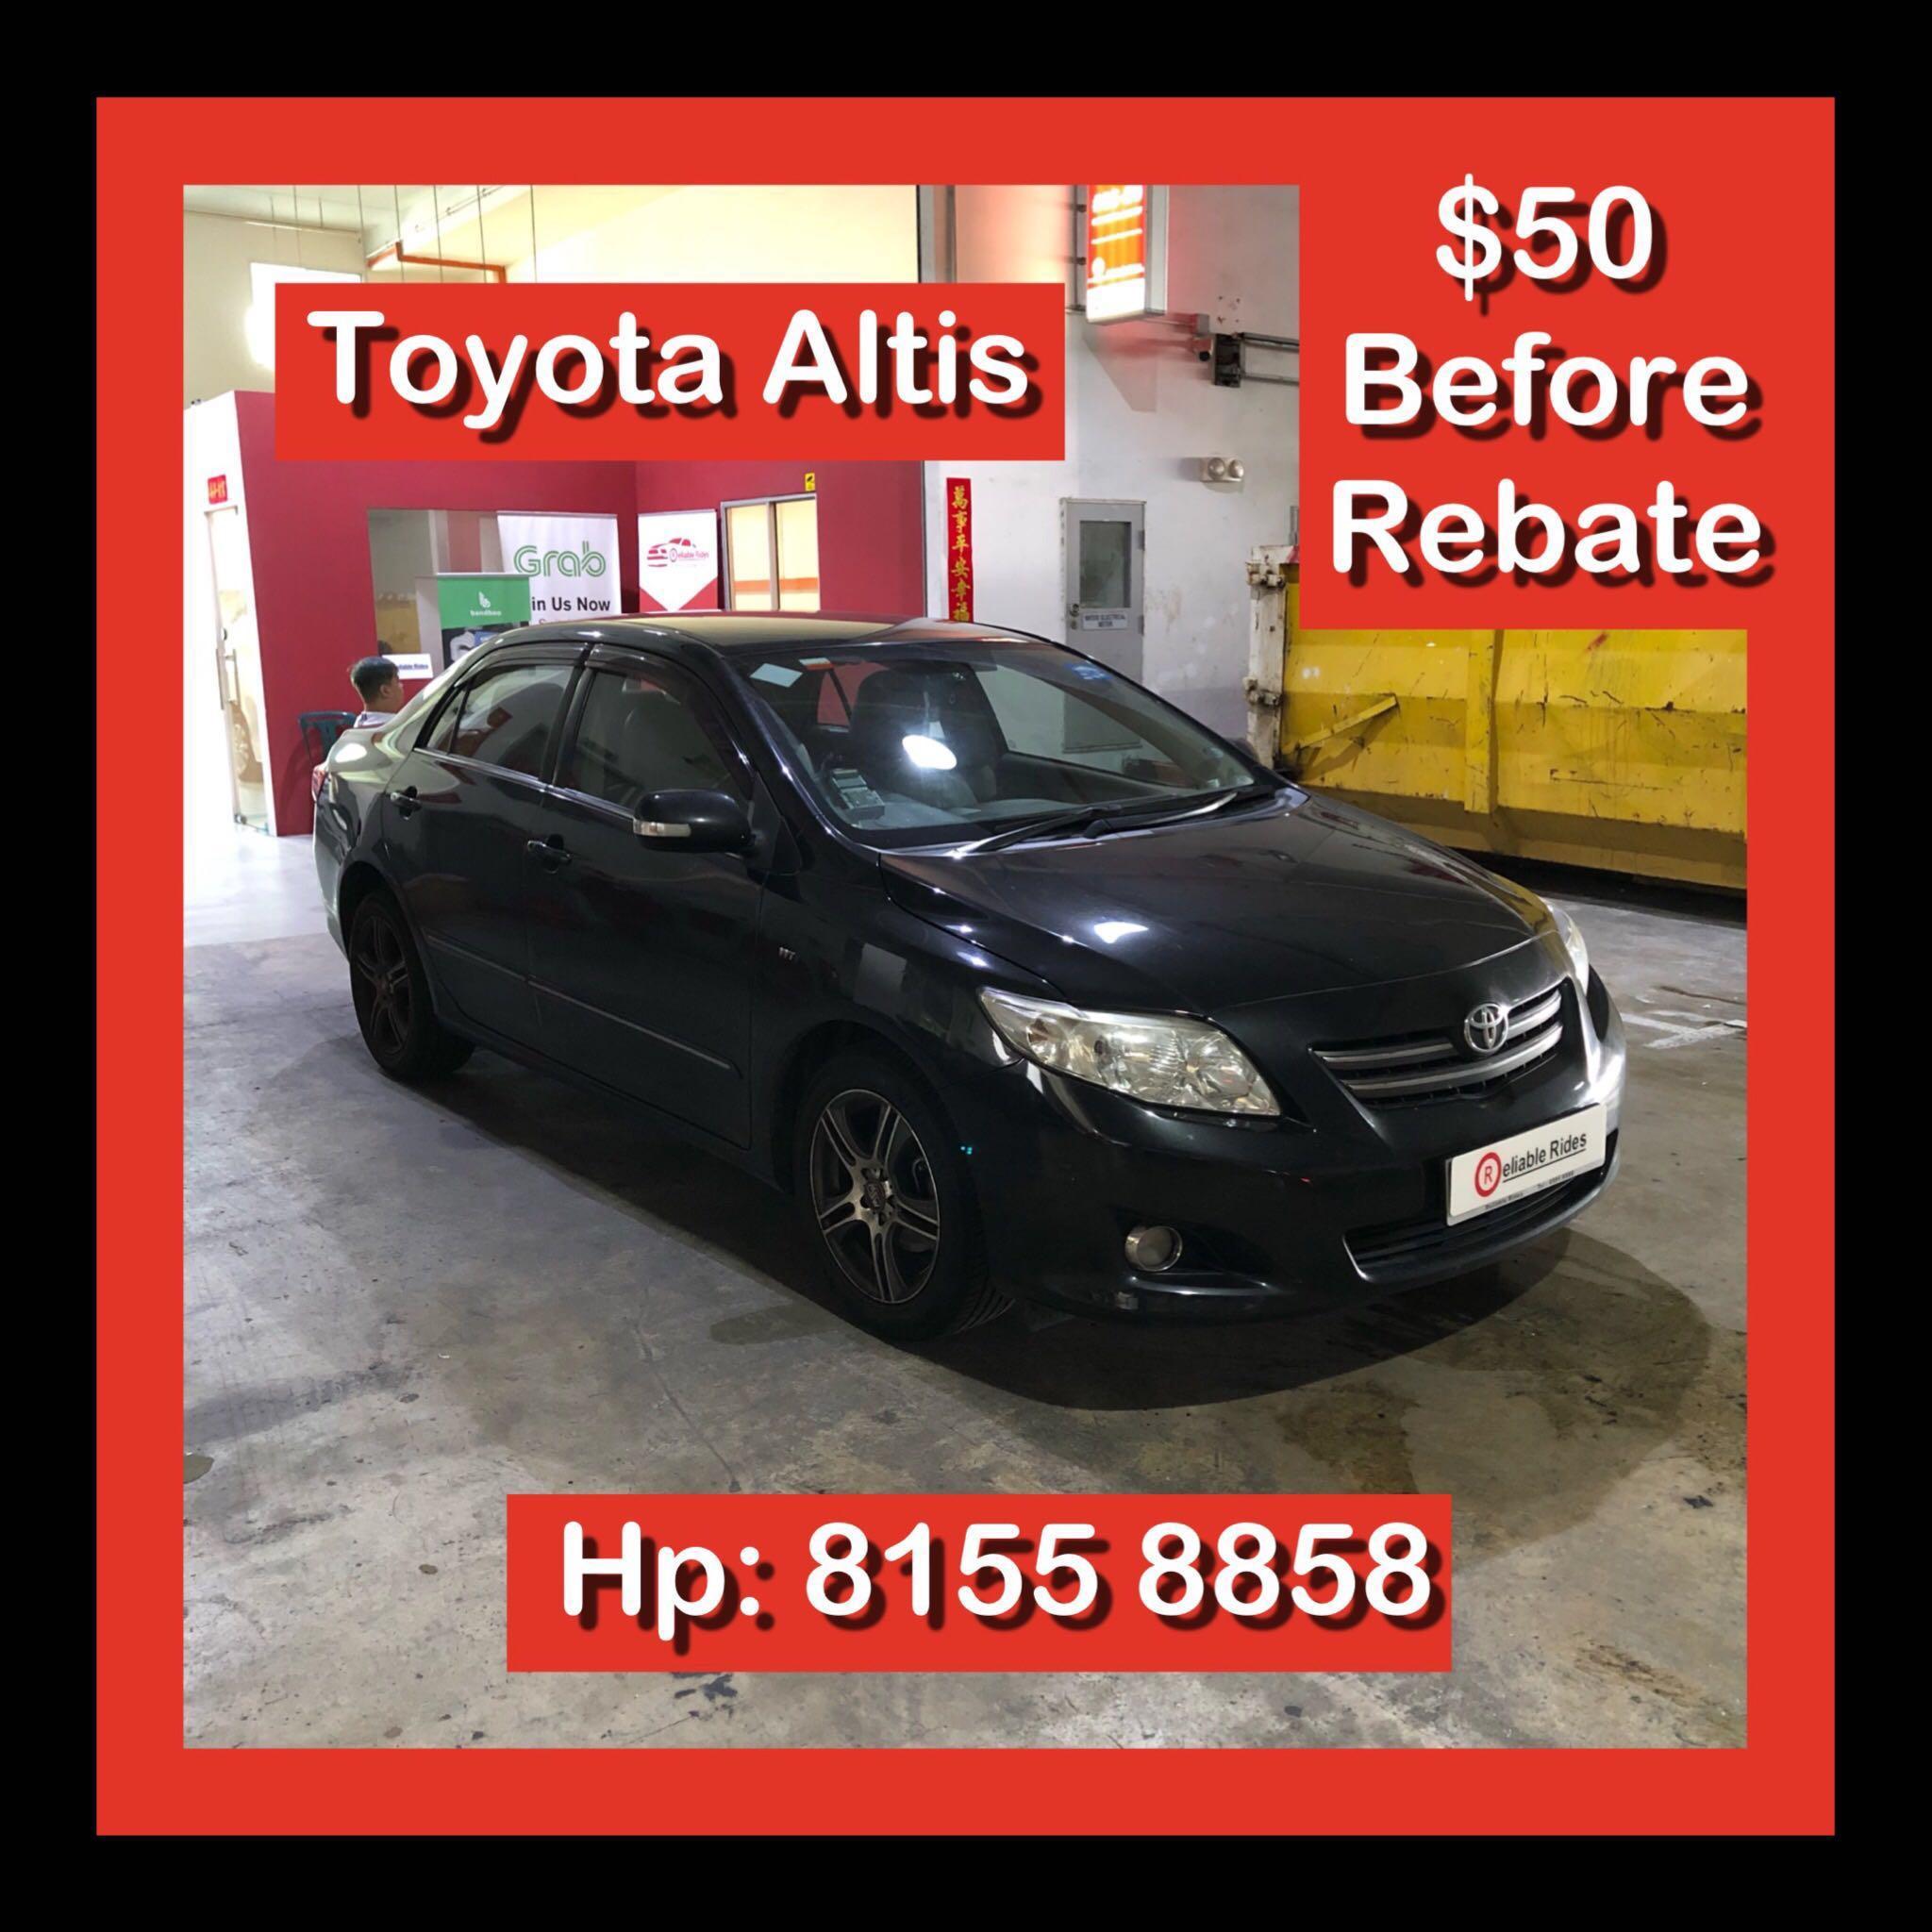 Toyota Altis 1.6 Auto Grab Car Rental